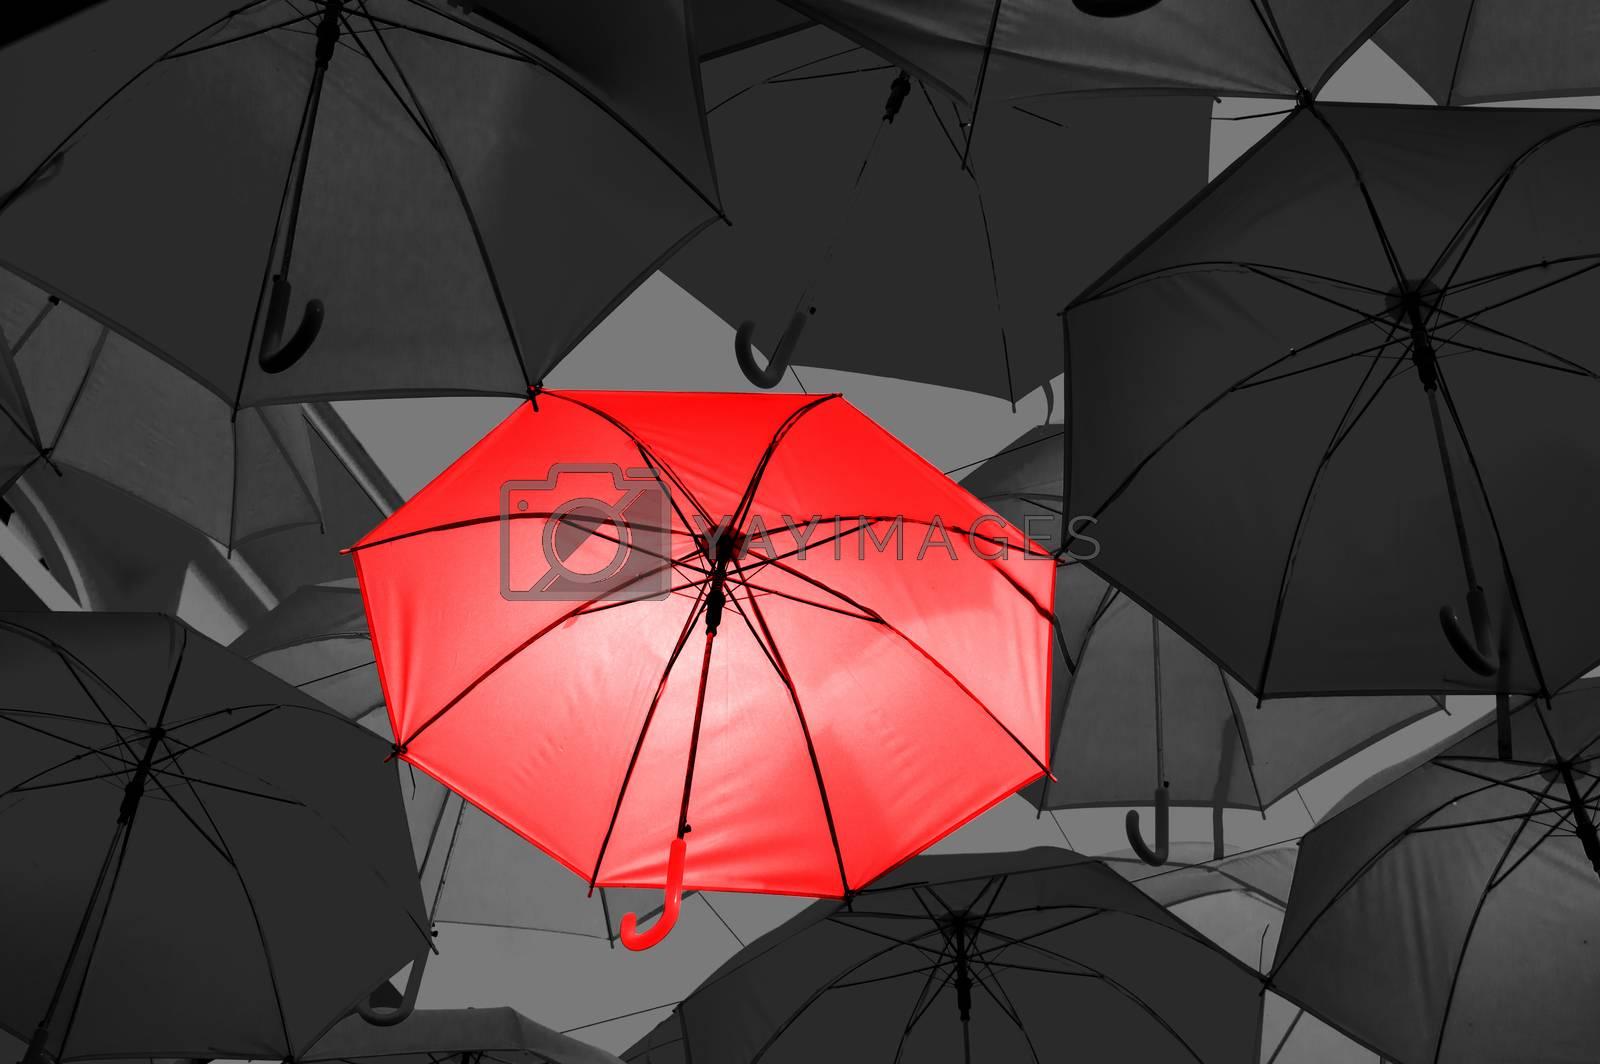 Red umbrella in black and white umbrellas by Nu1983